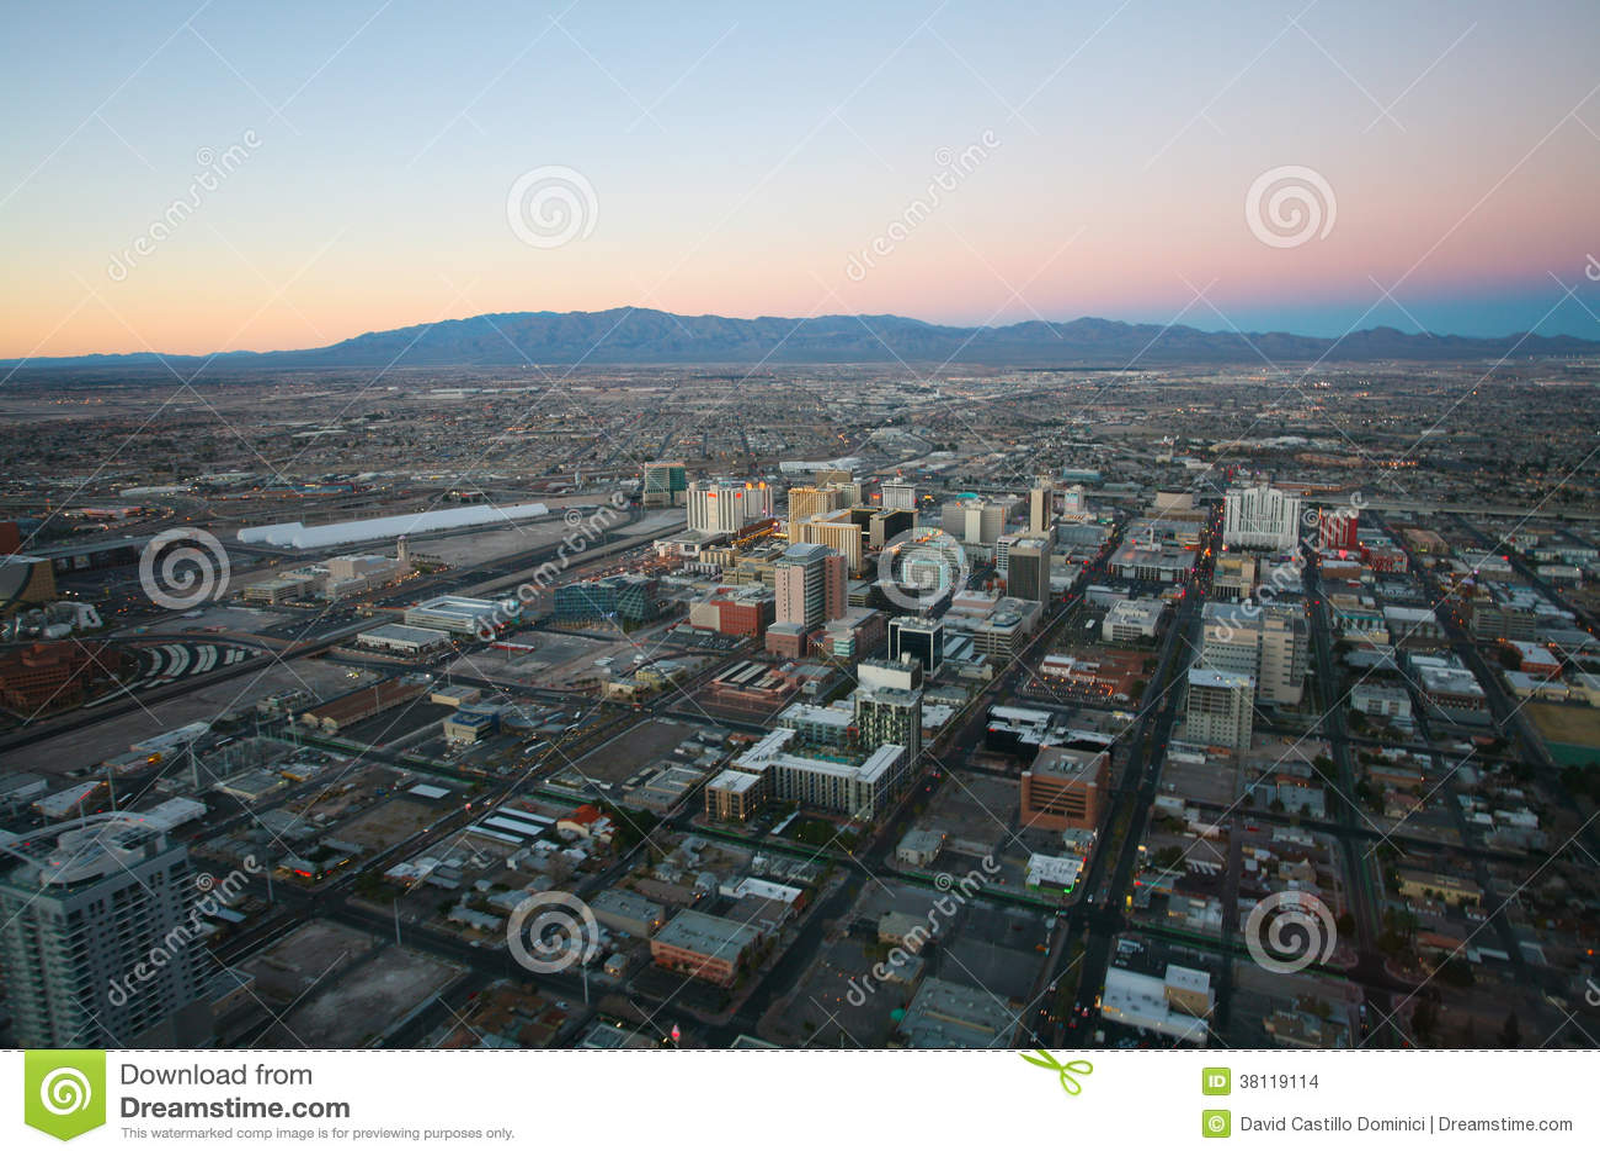 las vegas circa 2014 vegas sunset aerial panorama featured w editorial stock image image. Black Bedroom Furniture Sets. Home Design Ideas